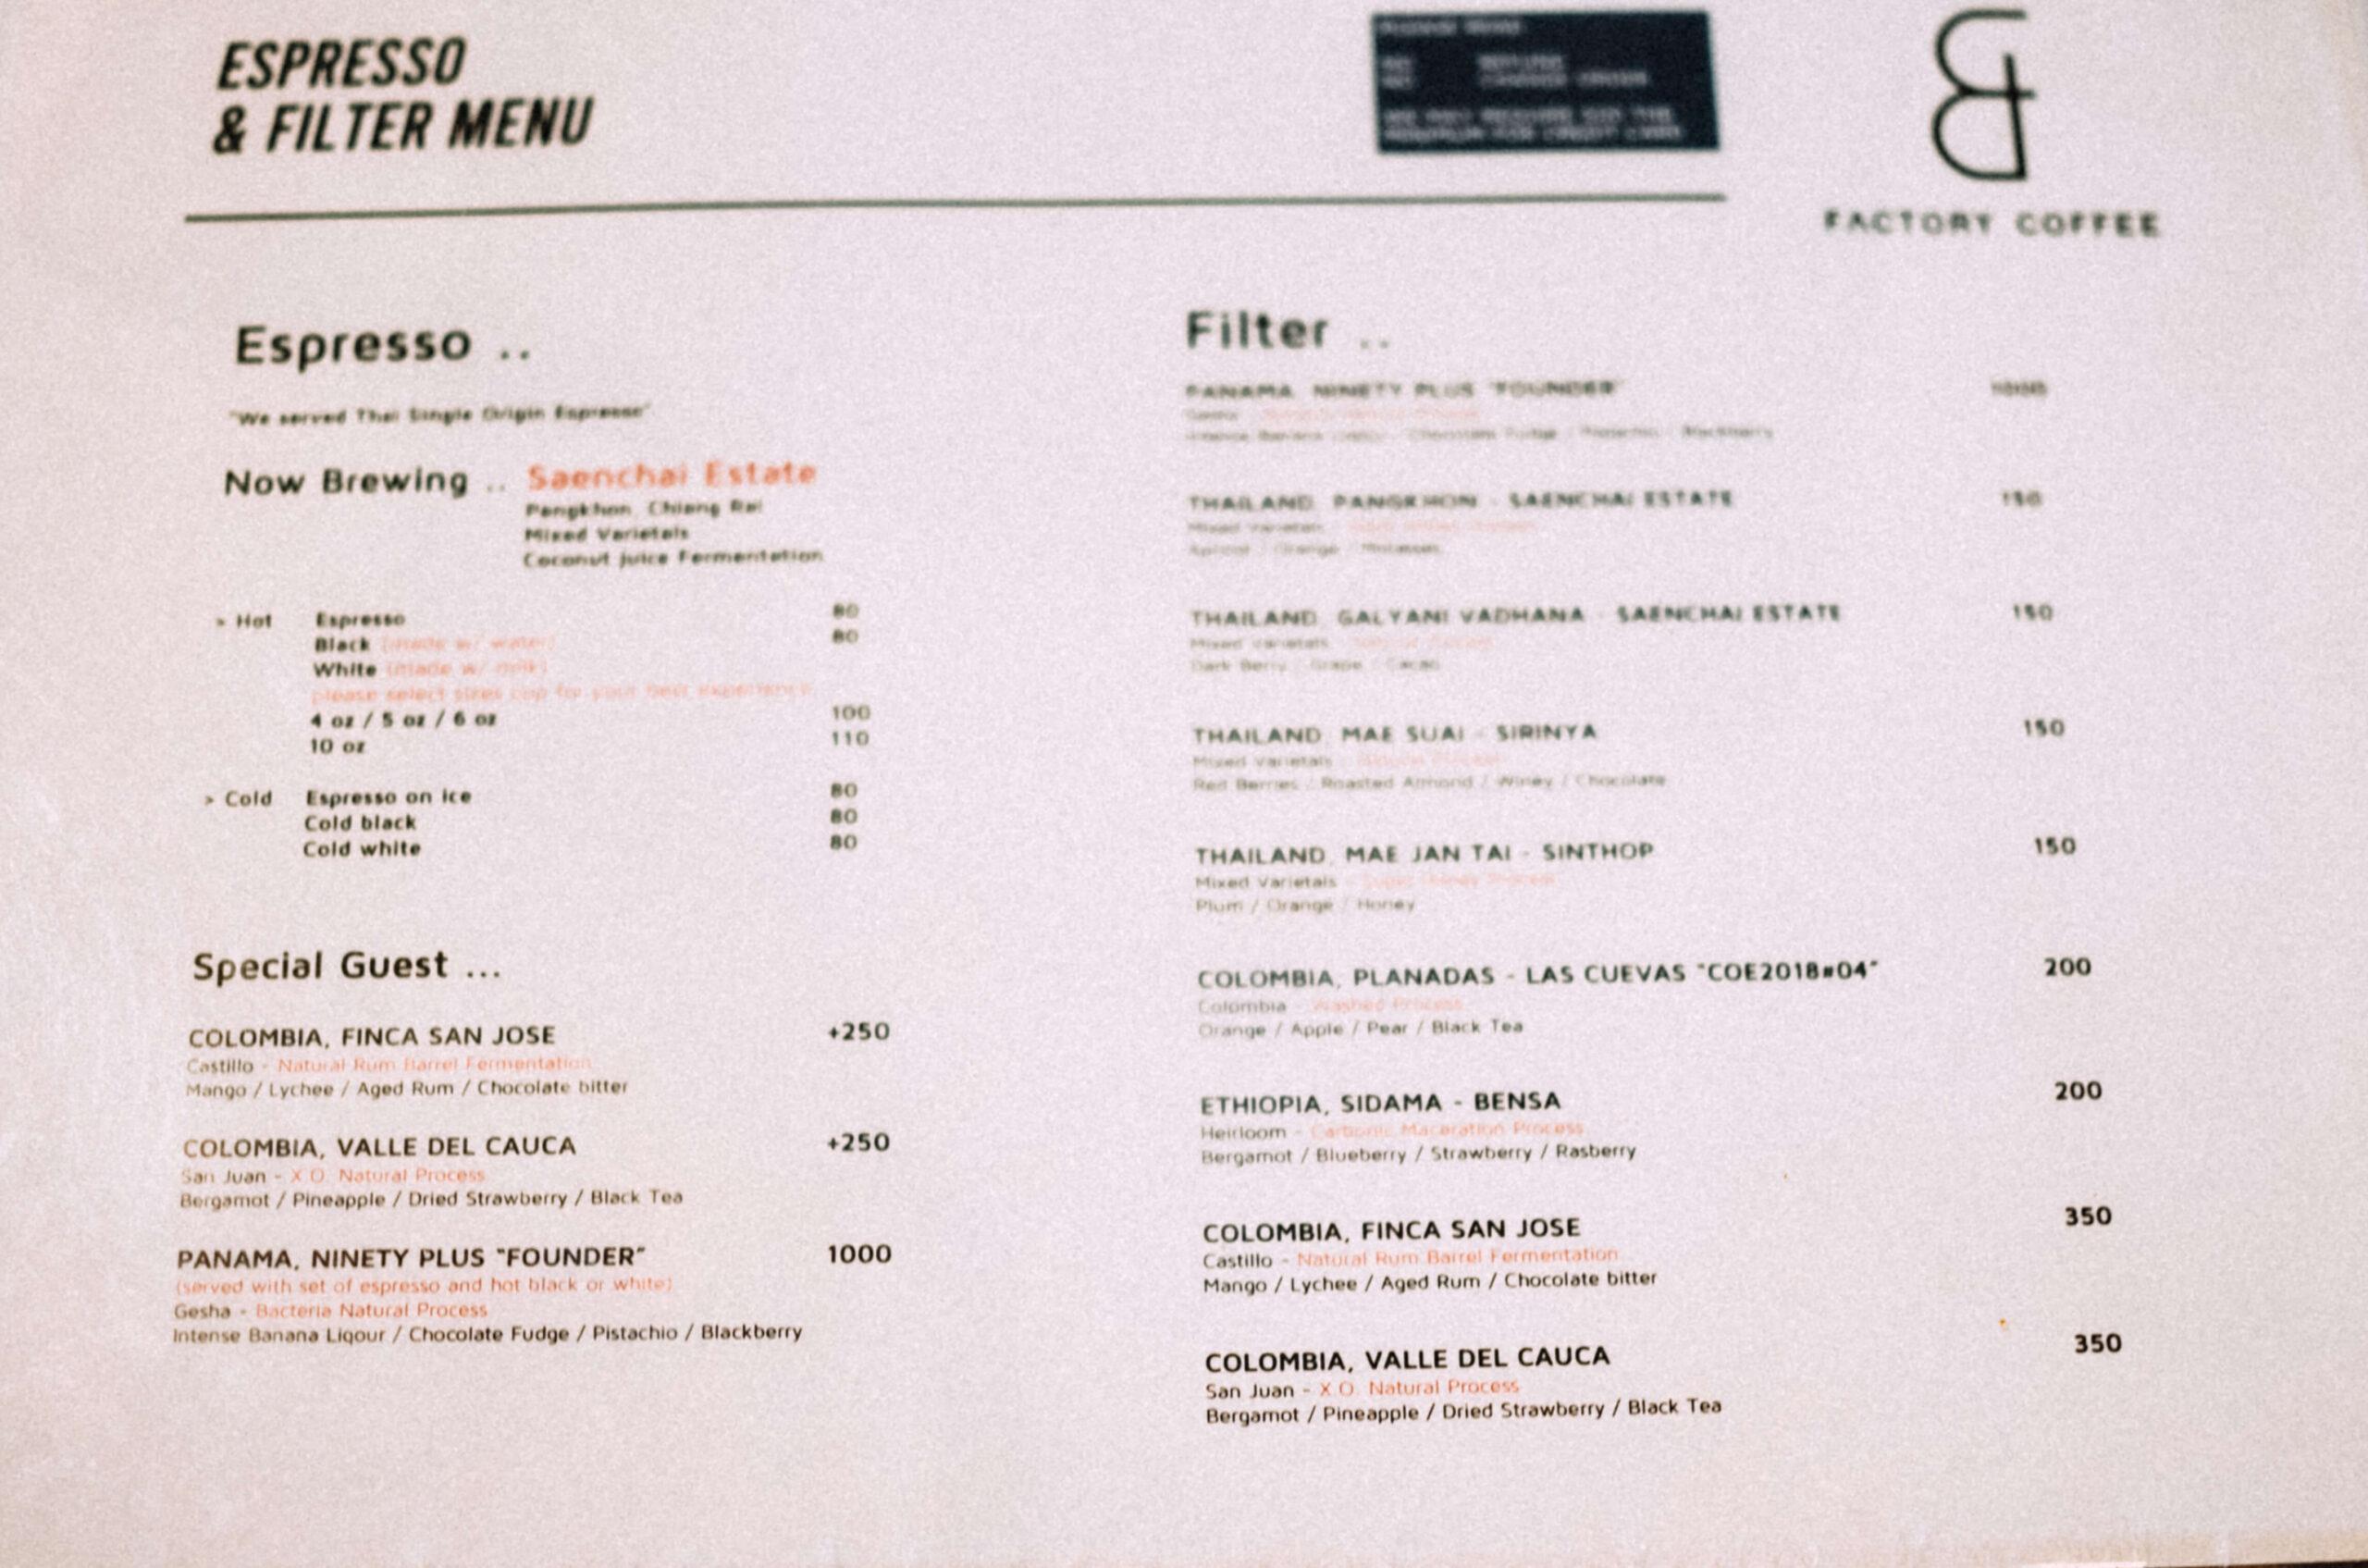 factory coffee menu